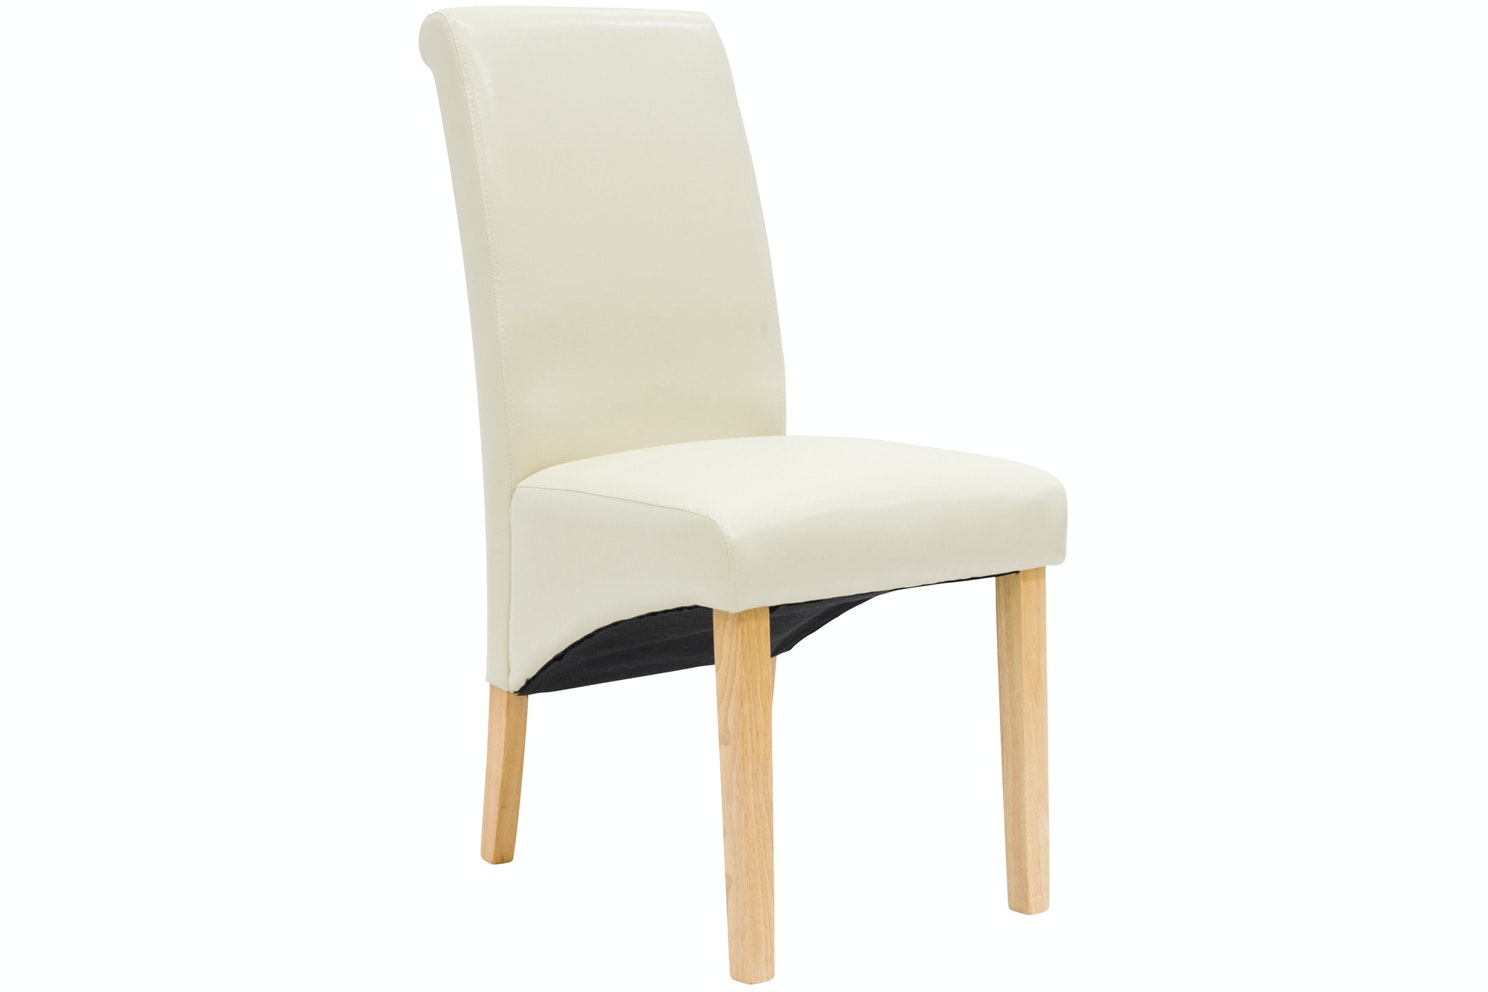 wilton-chair